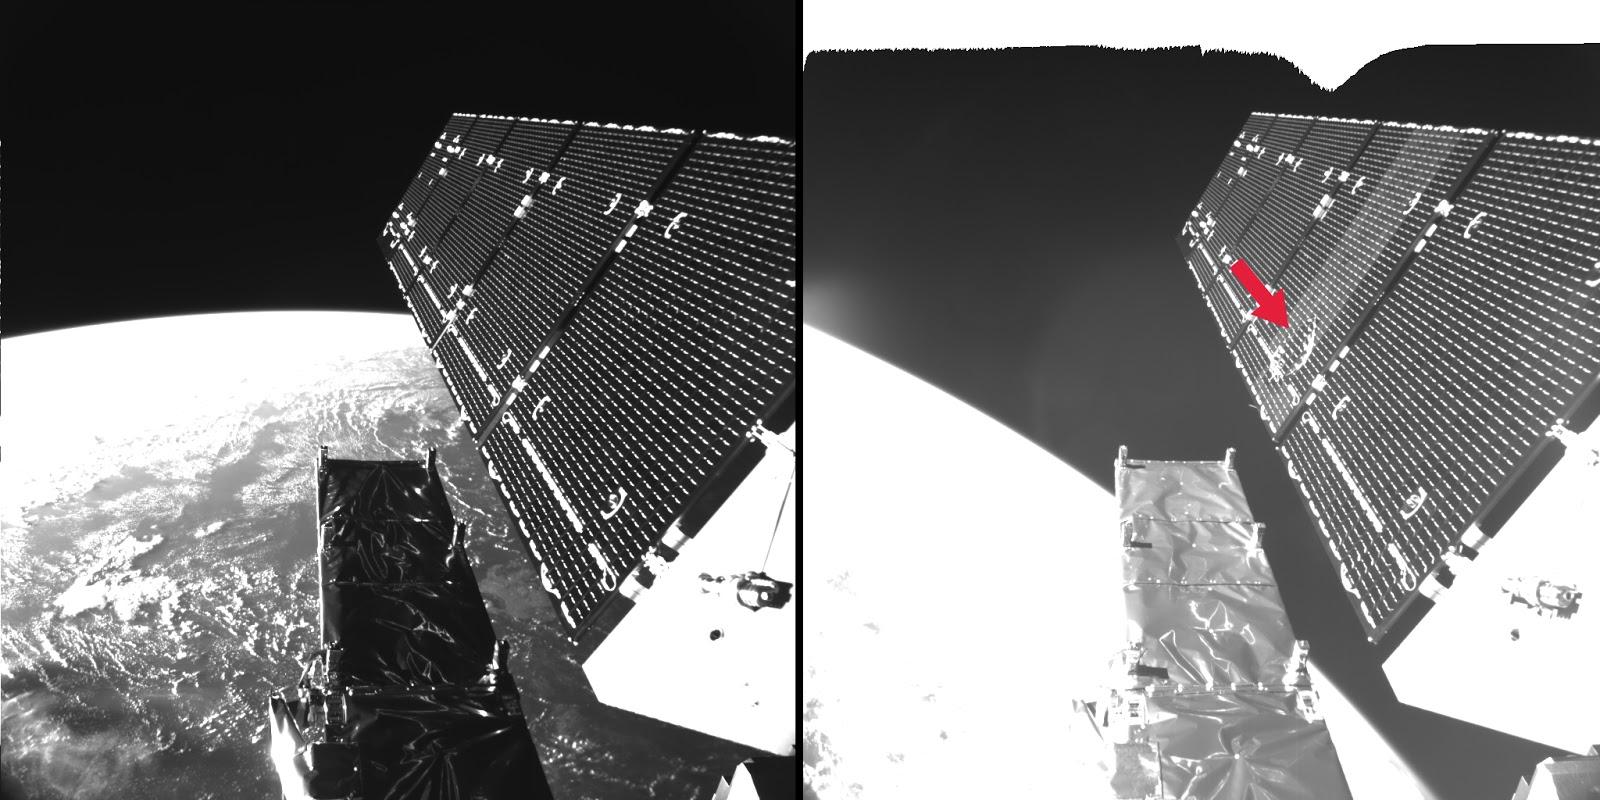 Orbiter Ch Space News Copernicus Sentinel 1a Satellite